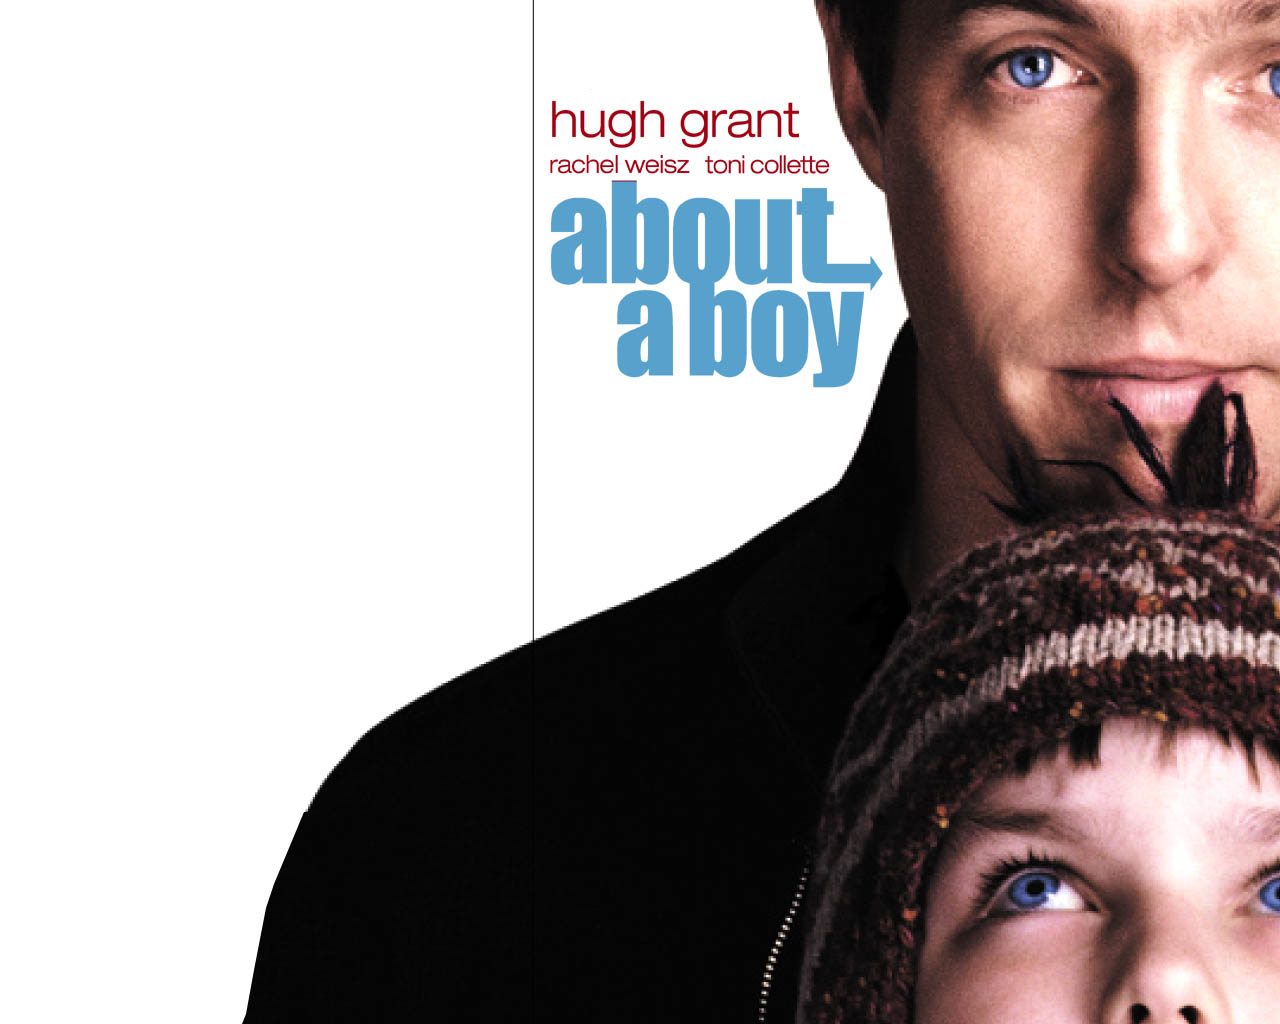 About A Boy Images About A Boy Hd Fond Décran And Background Photos